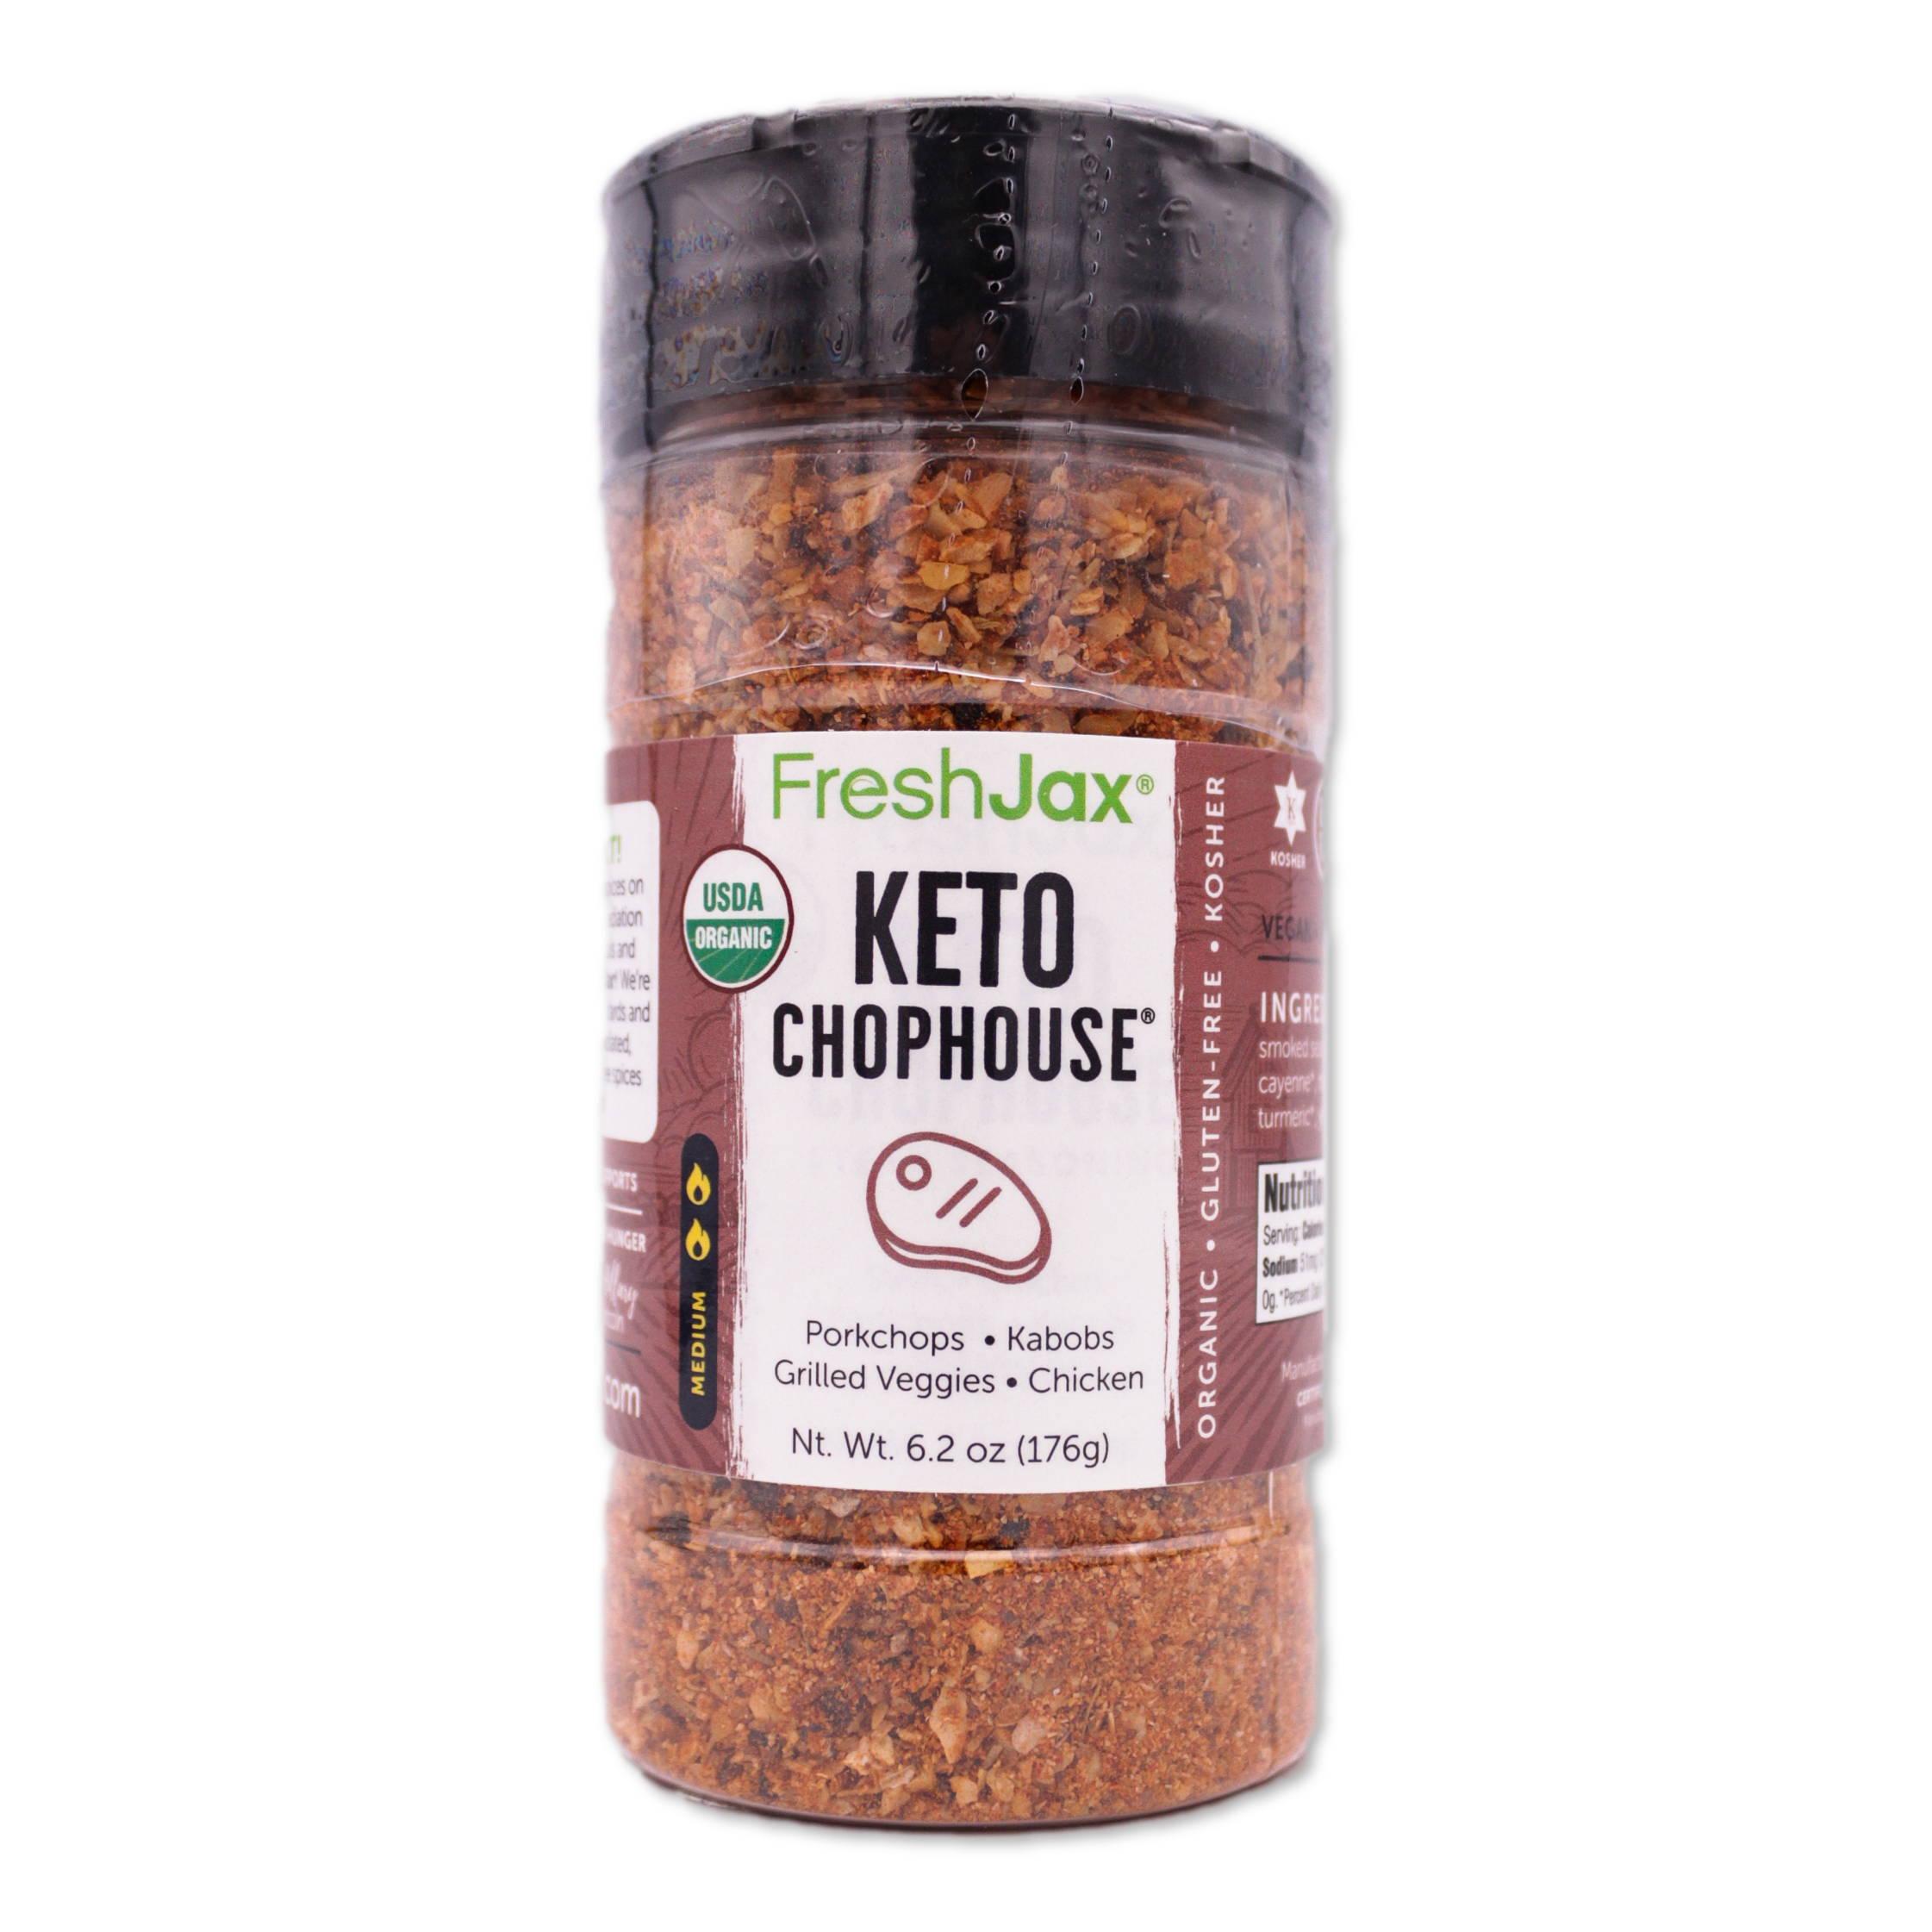 FreshJax Organic Spices Keto Chophouse Steak Seasoning large bottle